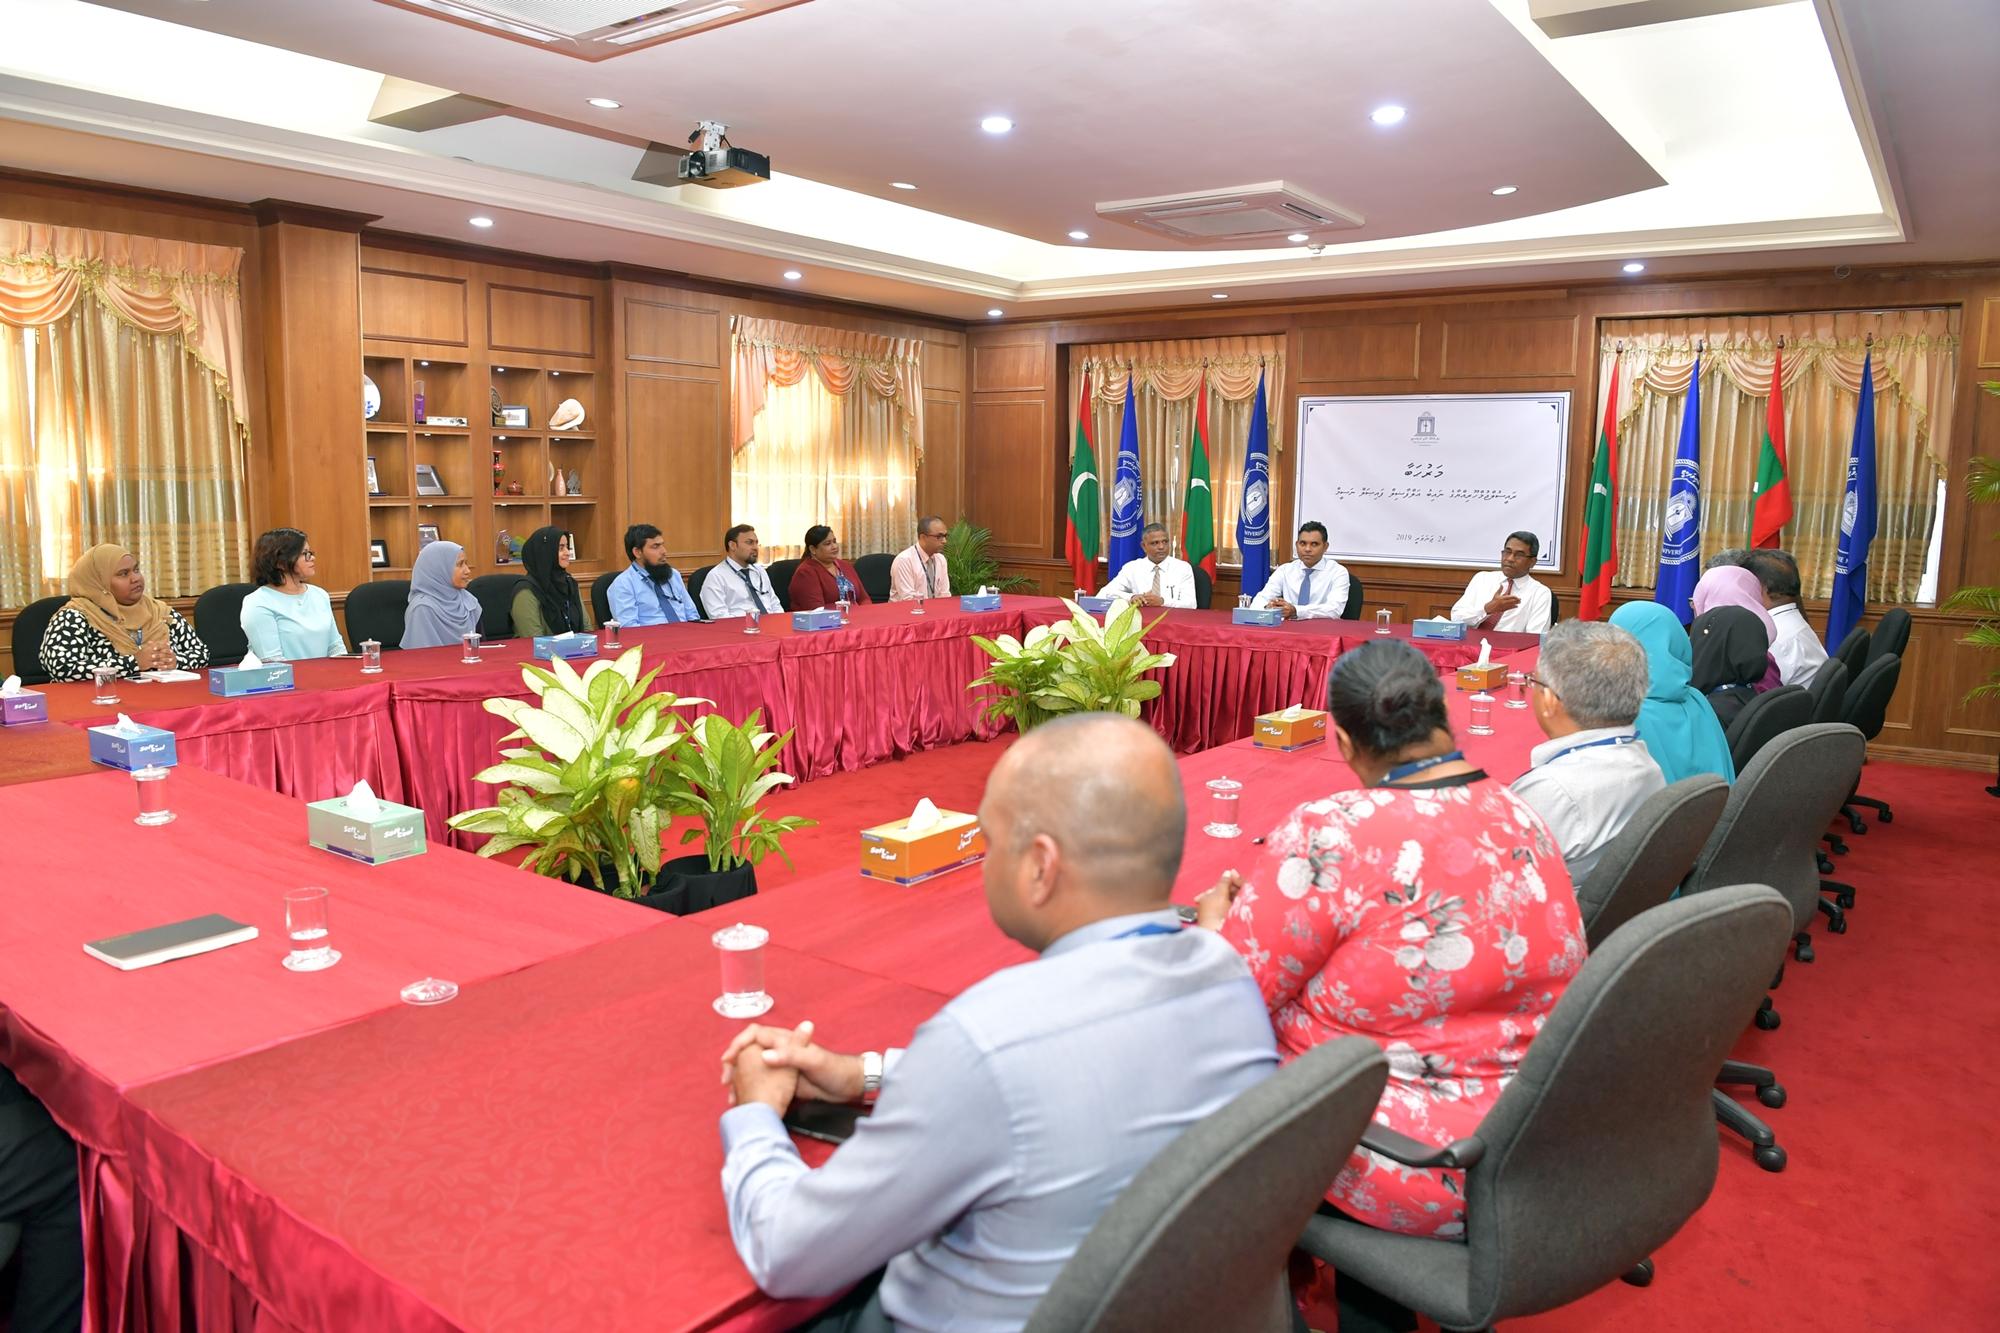 Vice President visits Maldives National University - The